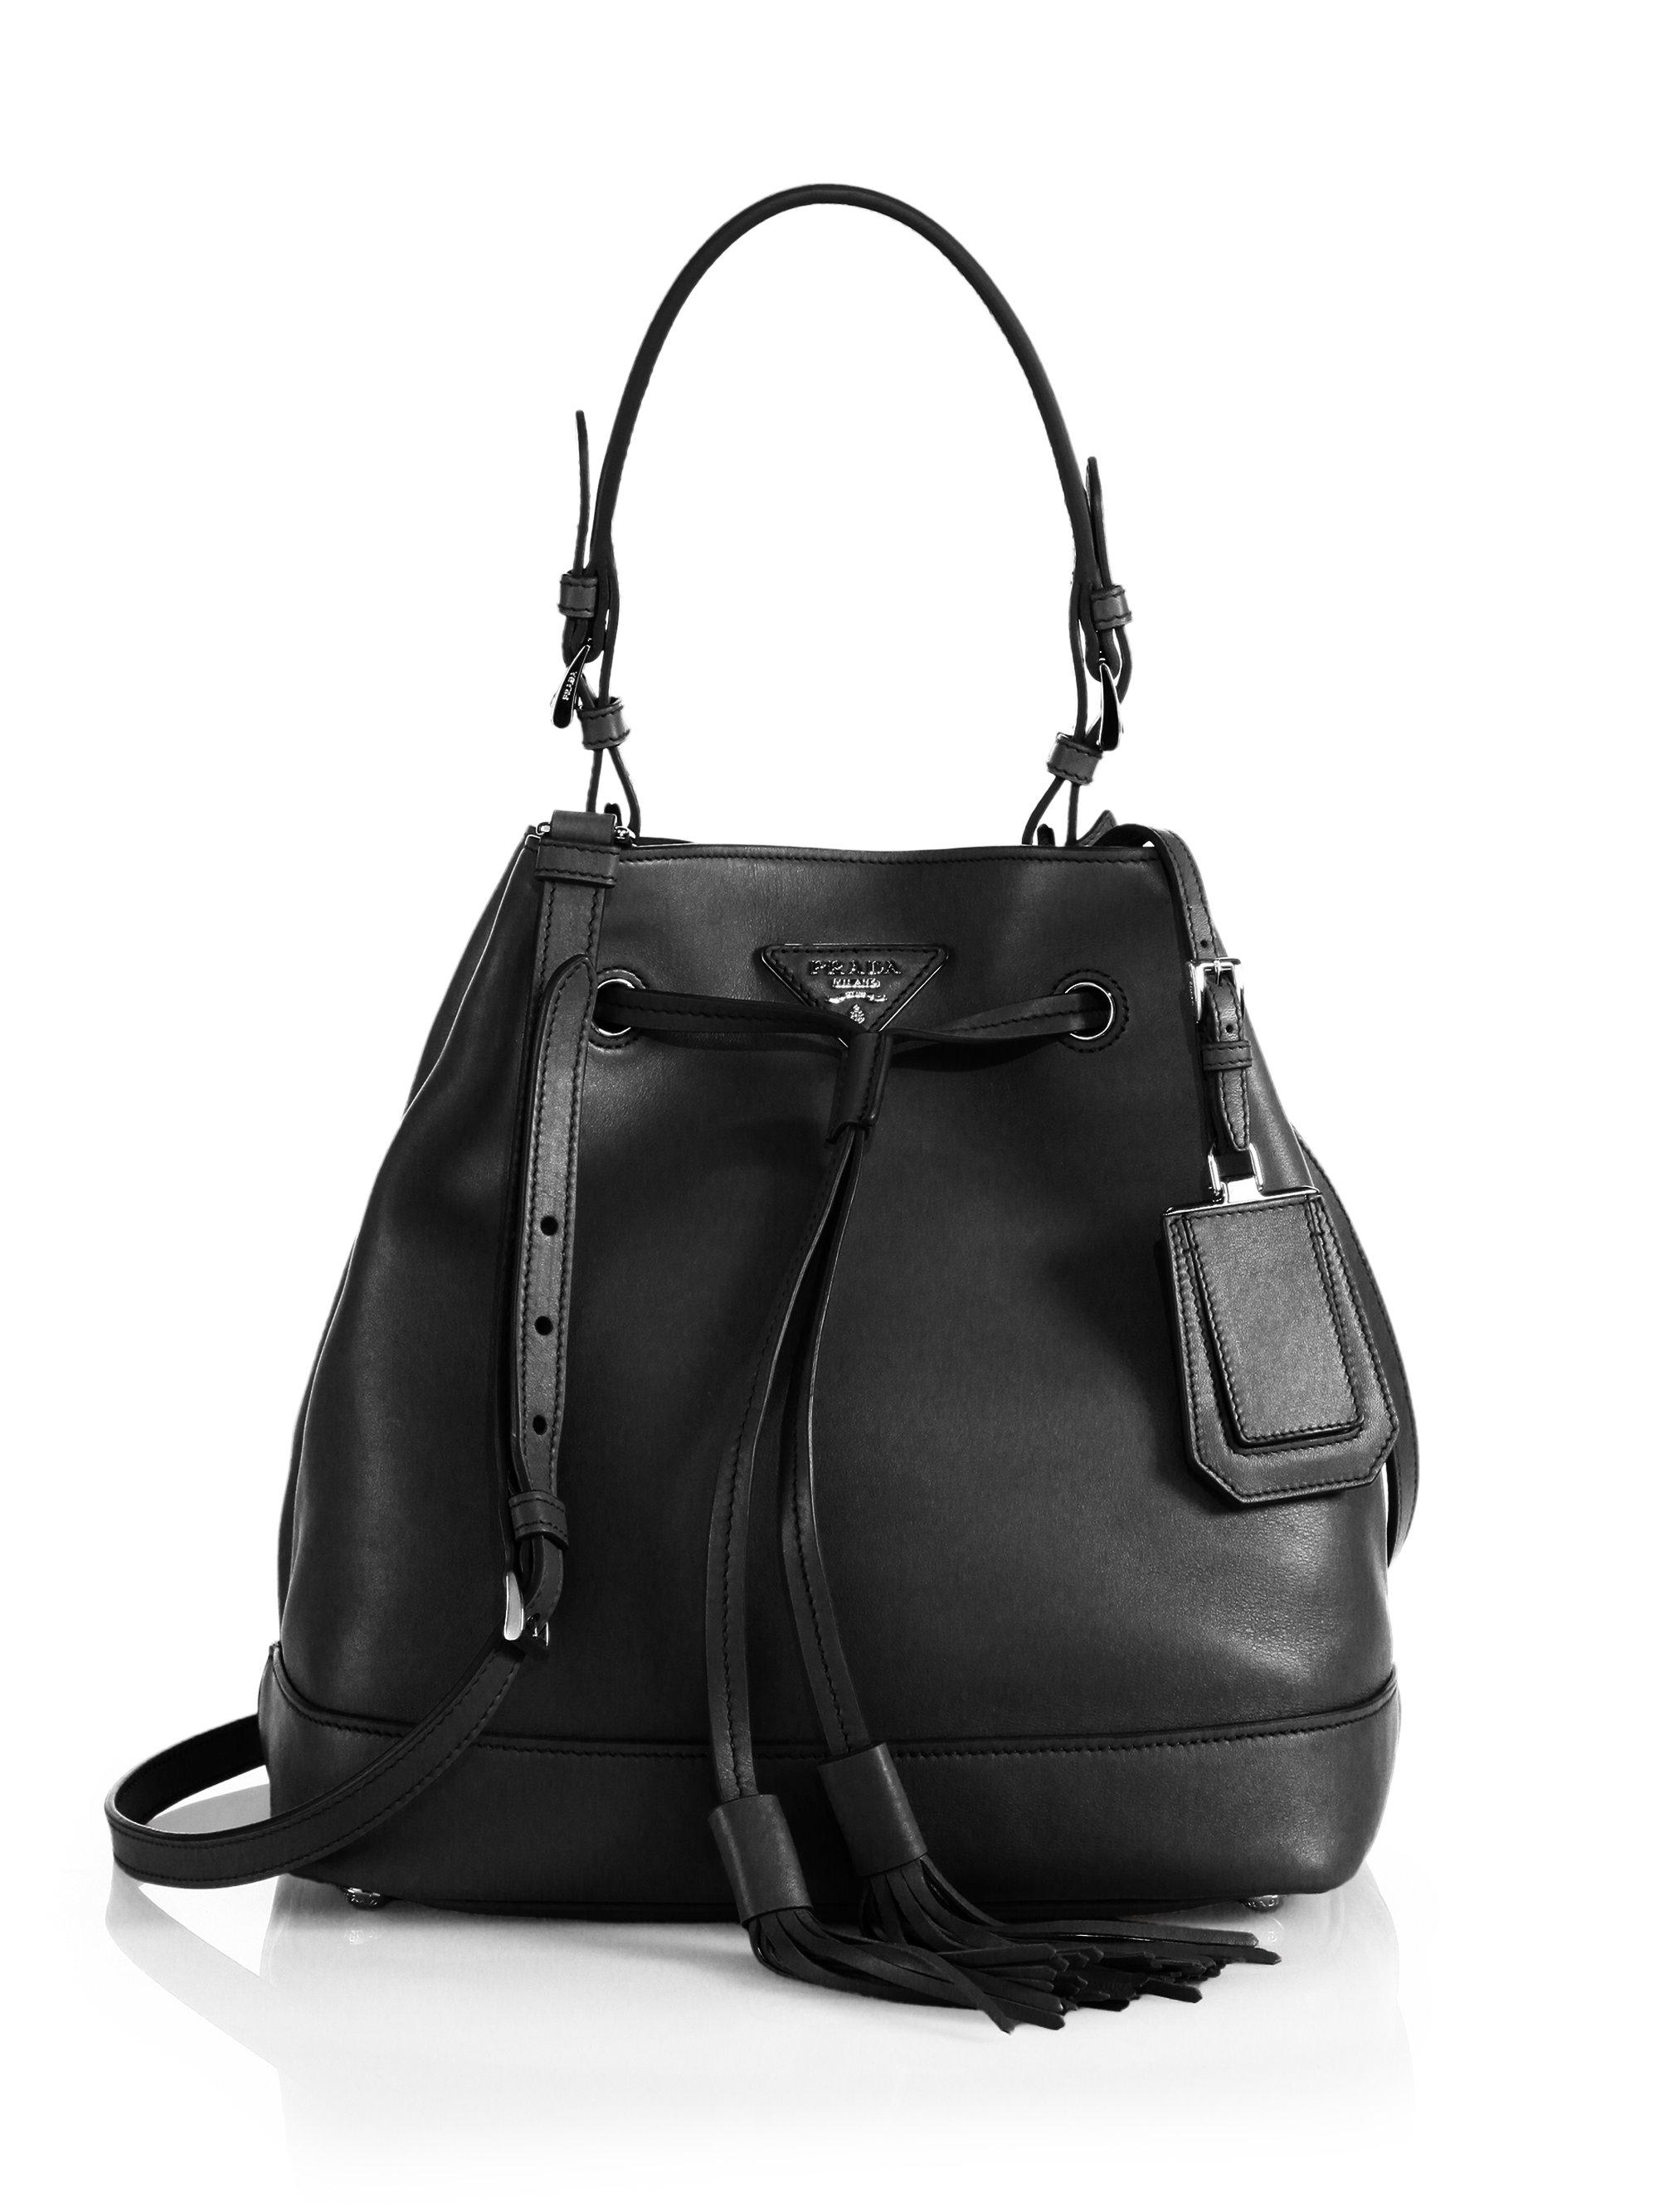 pink leather prada purse - Prada Large Bucket Bag in Black (NERO-BLACK) | Lyst